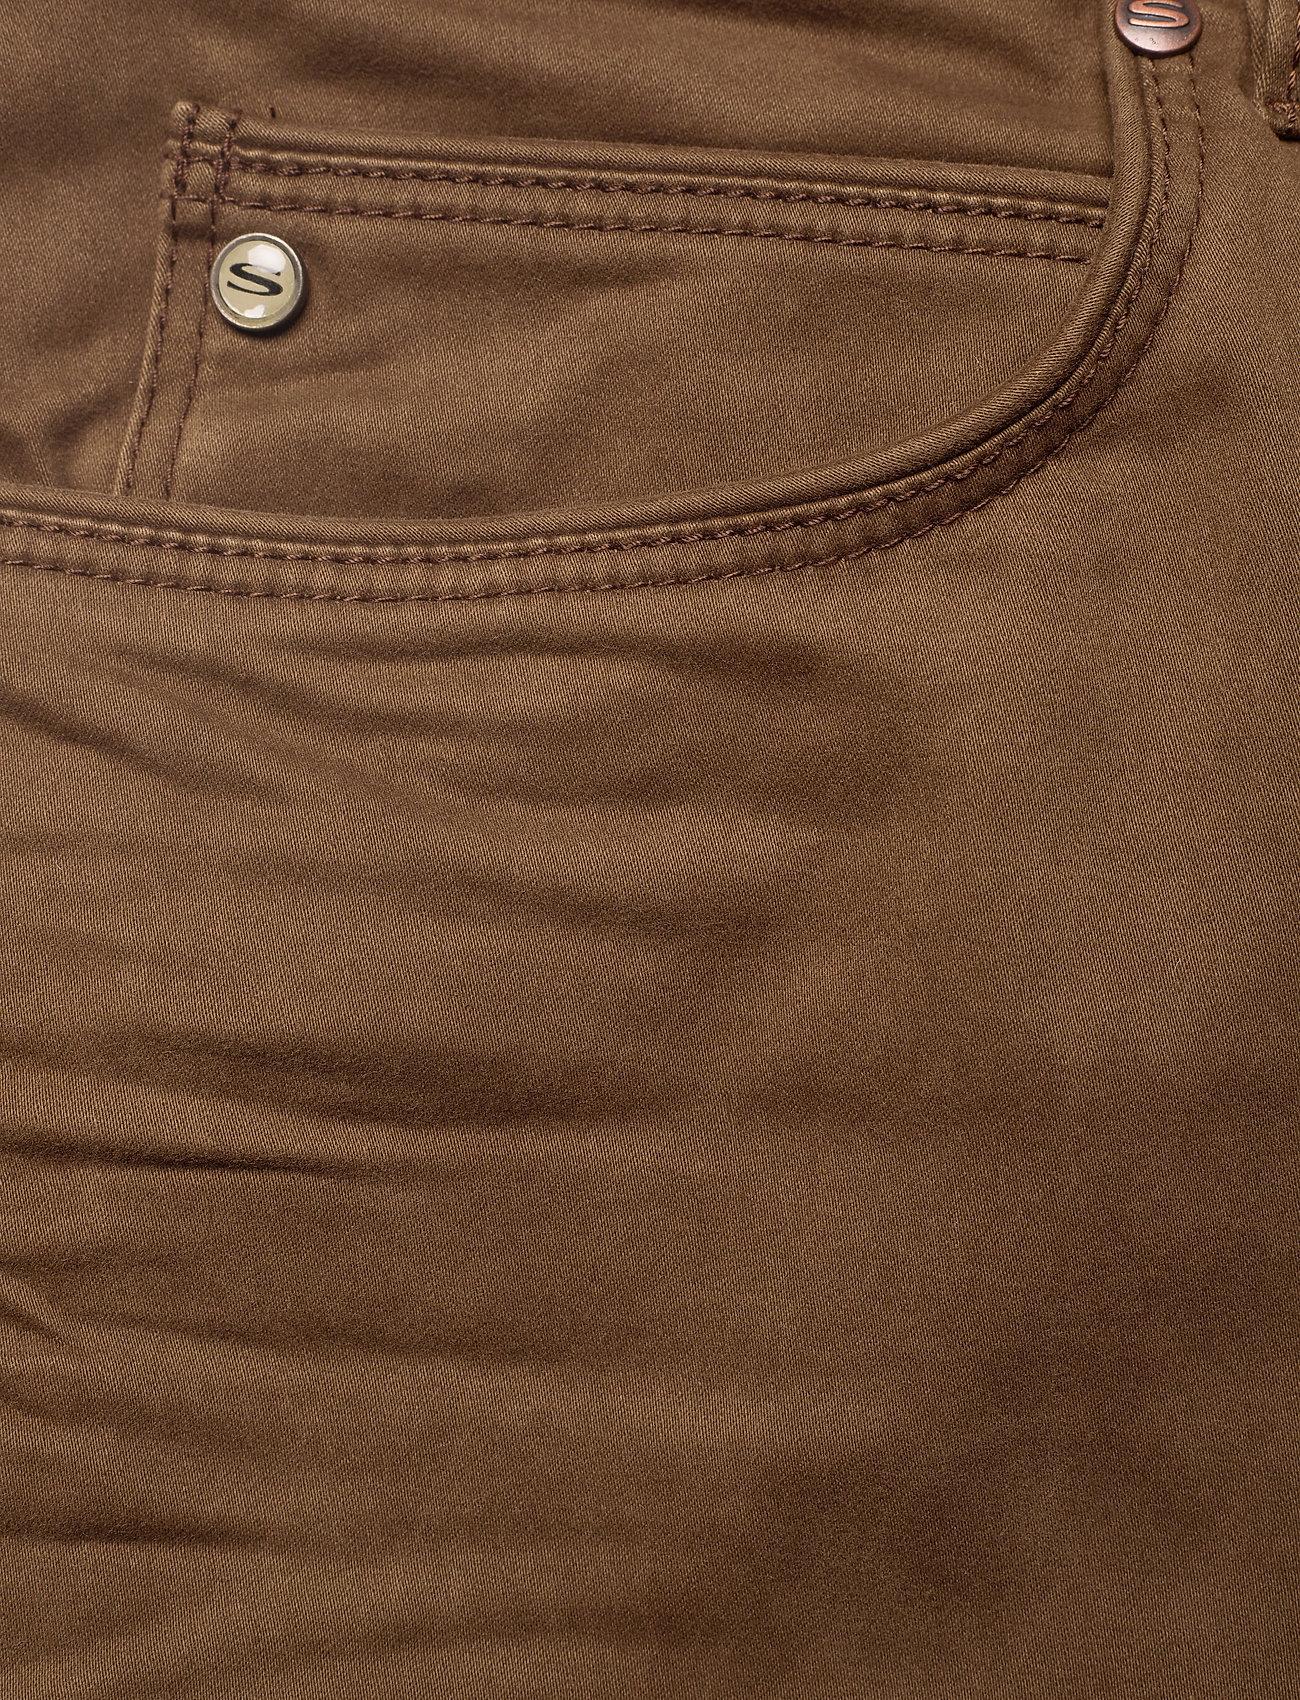 "SAND - Diamond Wash - Burton NS 32"" - casual trousers - brown - 2"